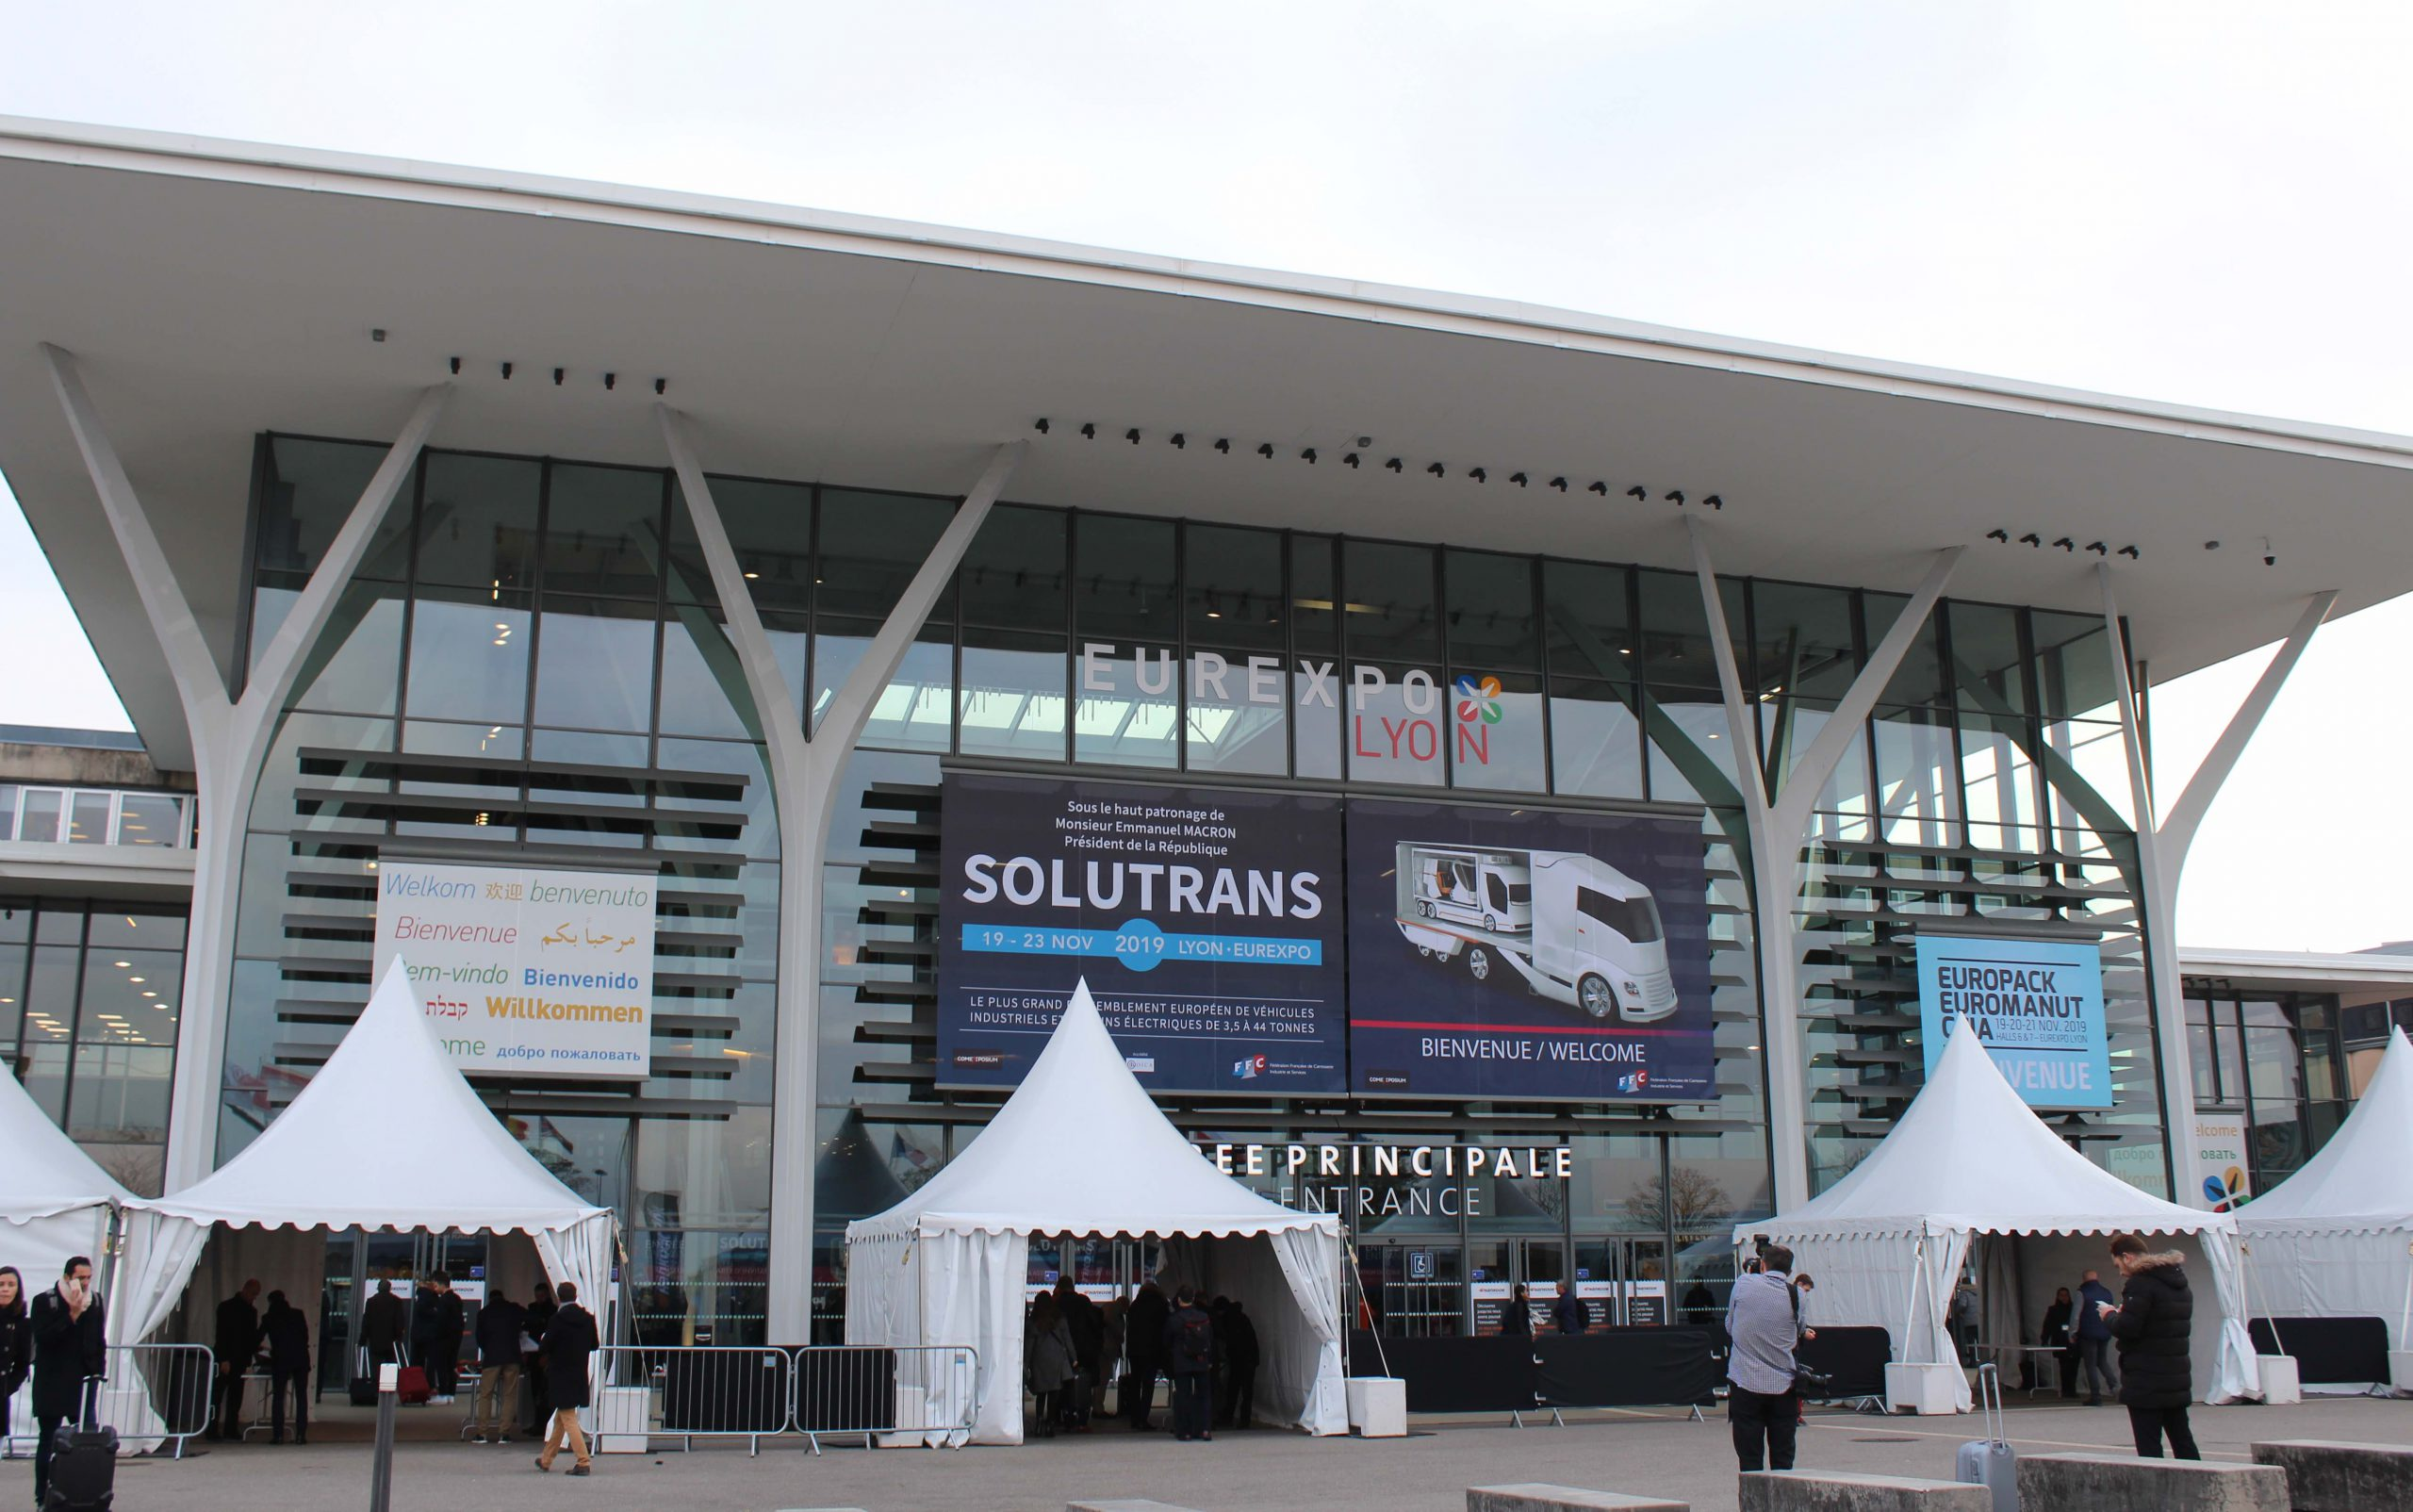 Solutrans 2019